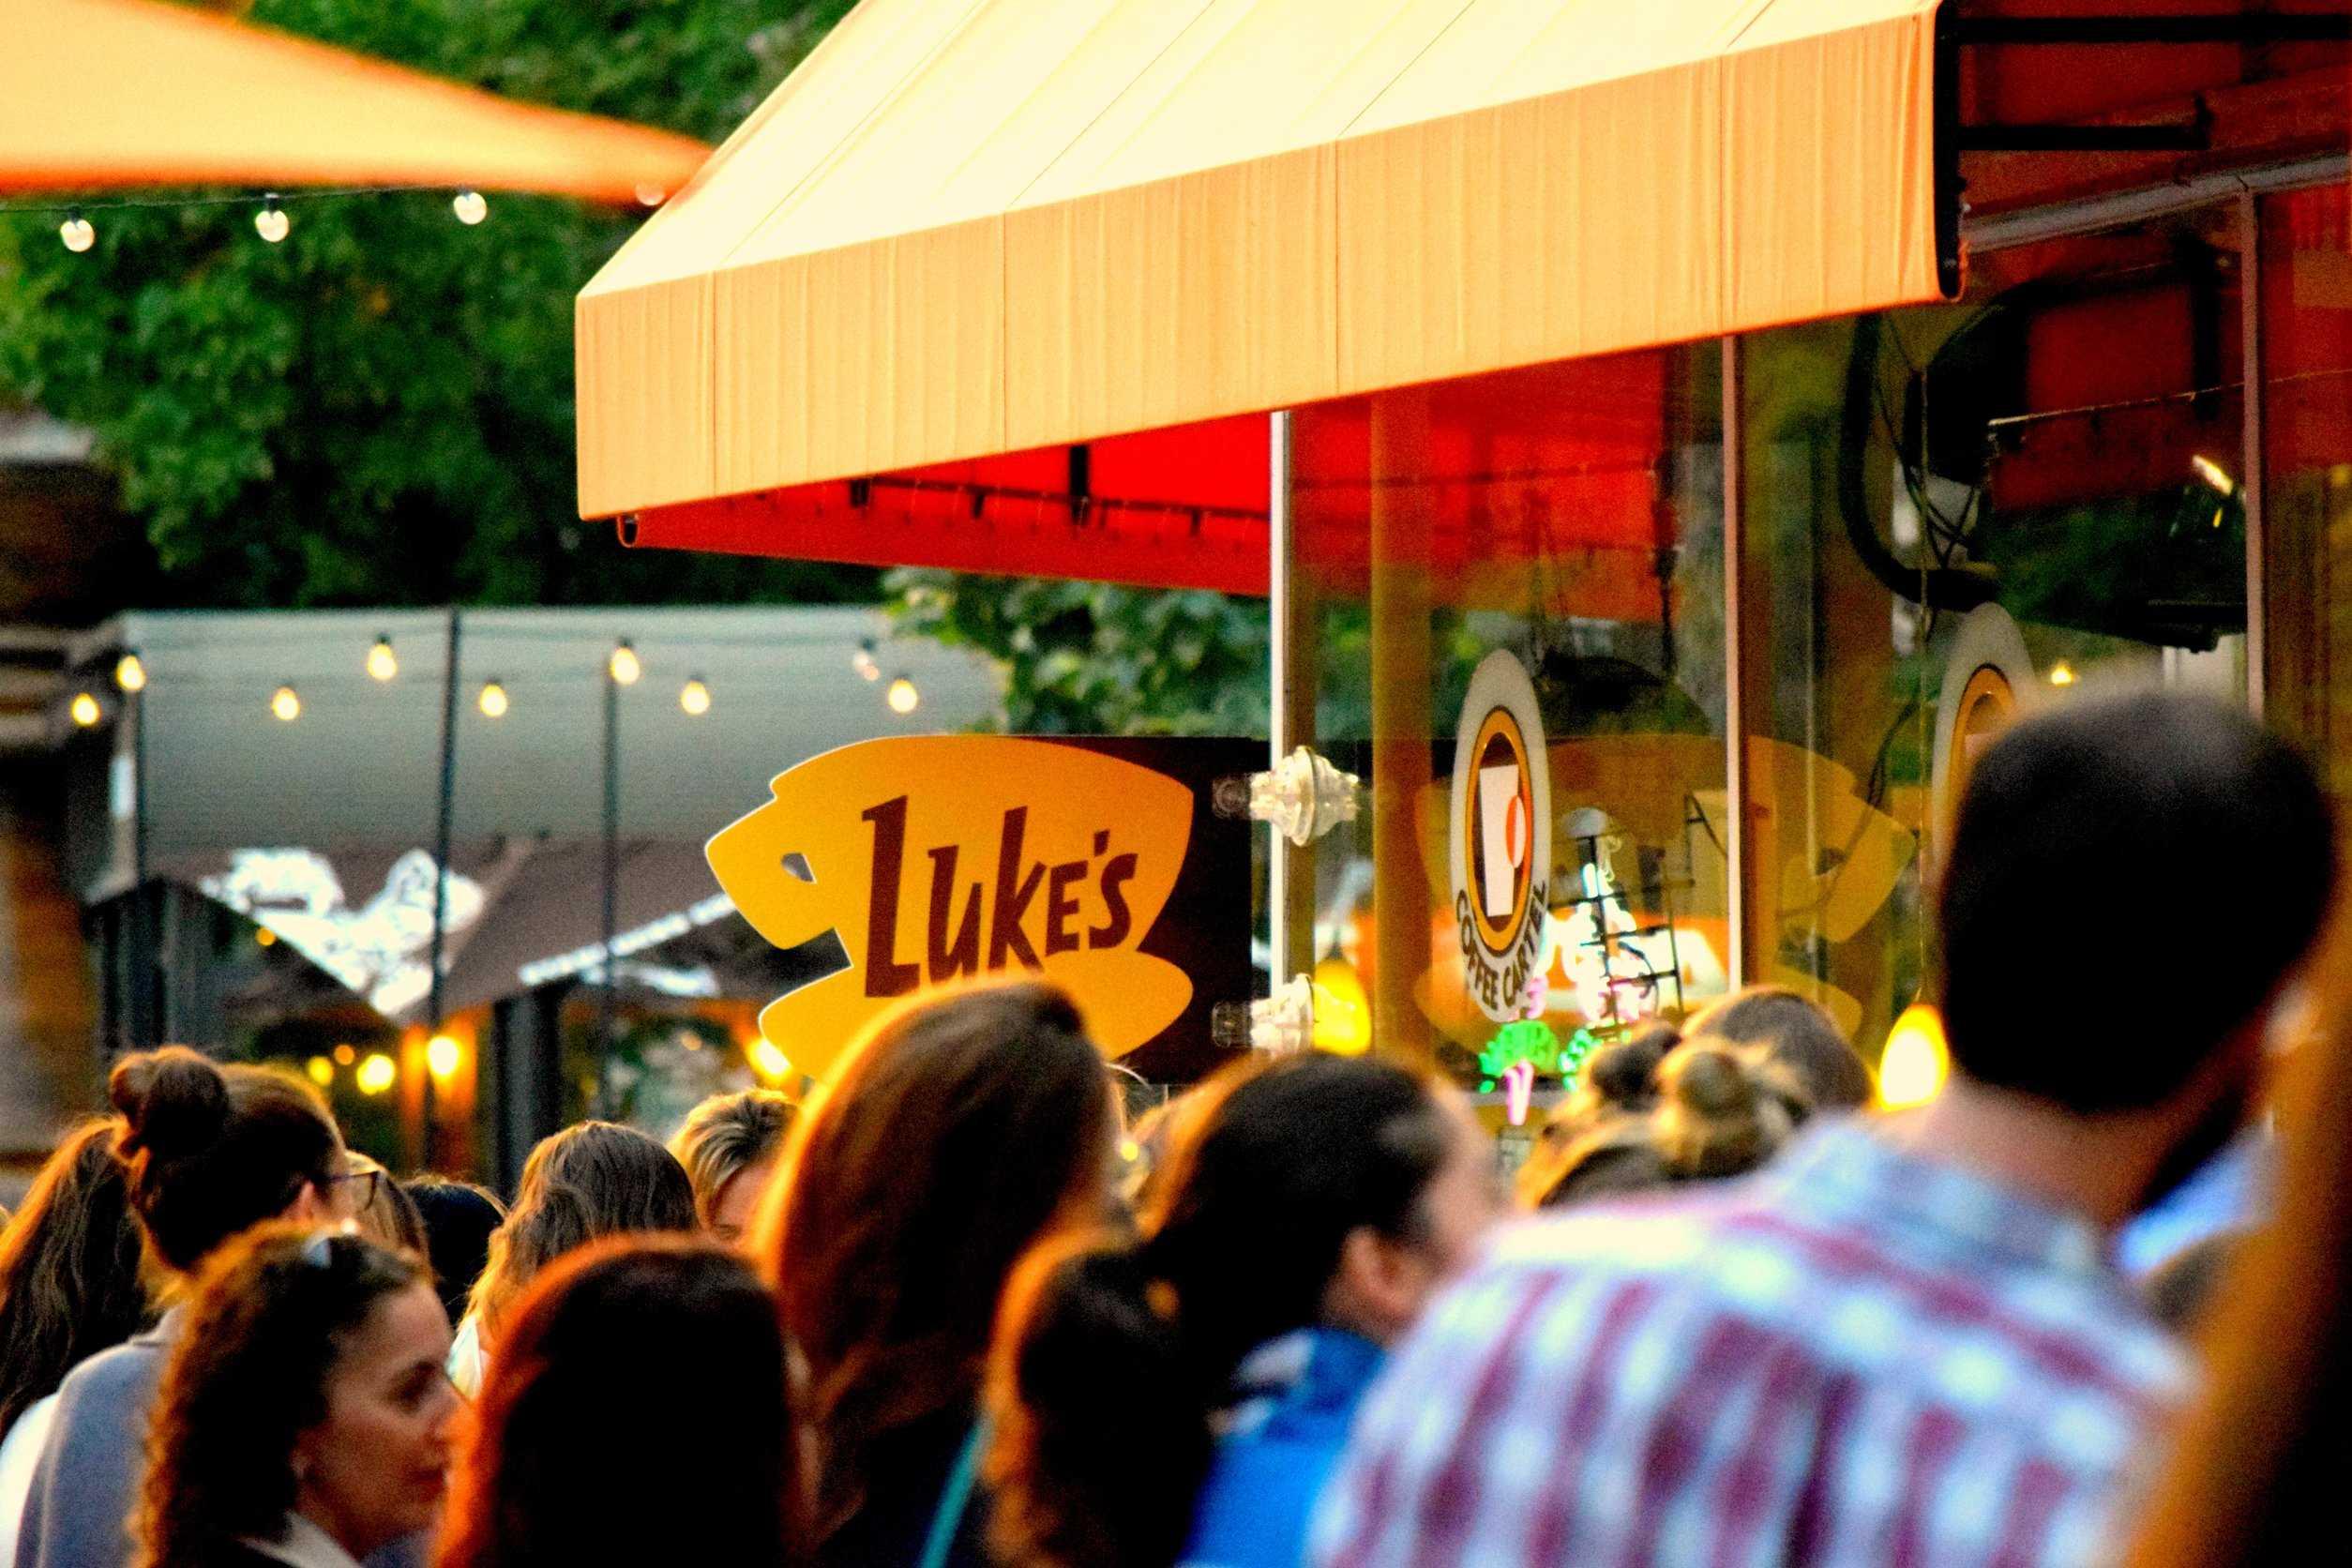 Netflix+hosts+pop-up+Luke%27s+Diner